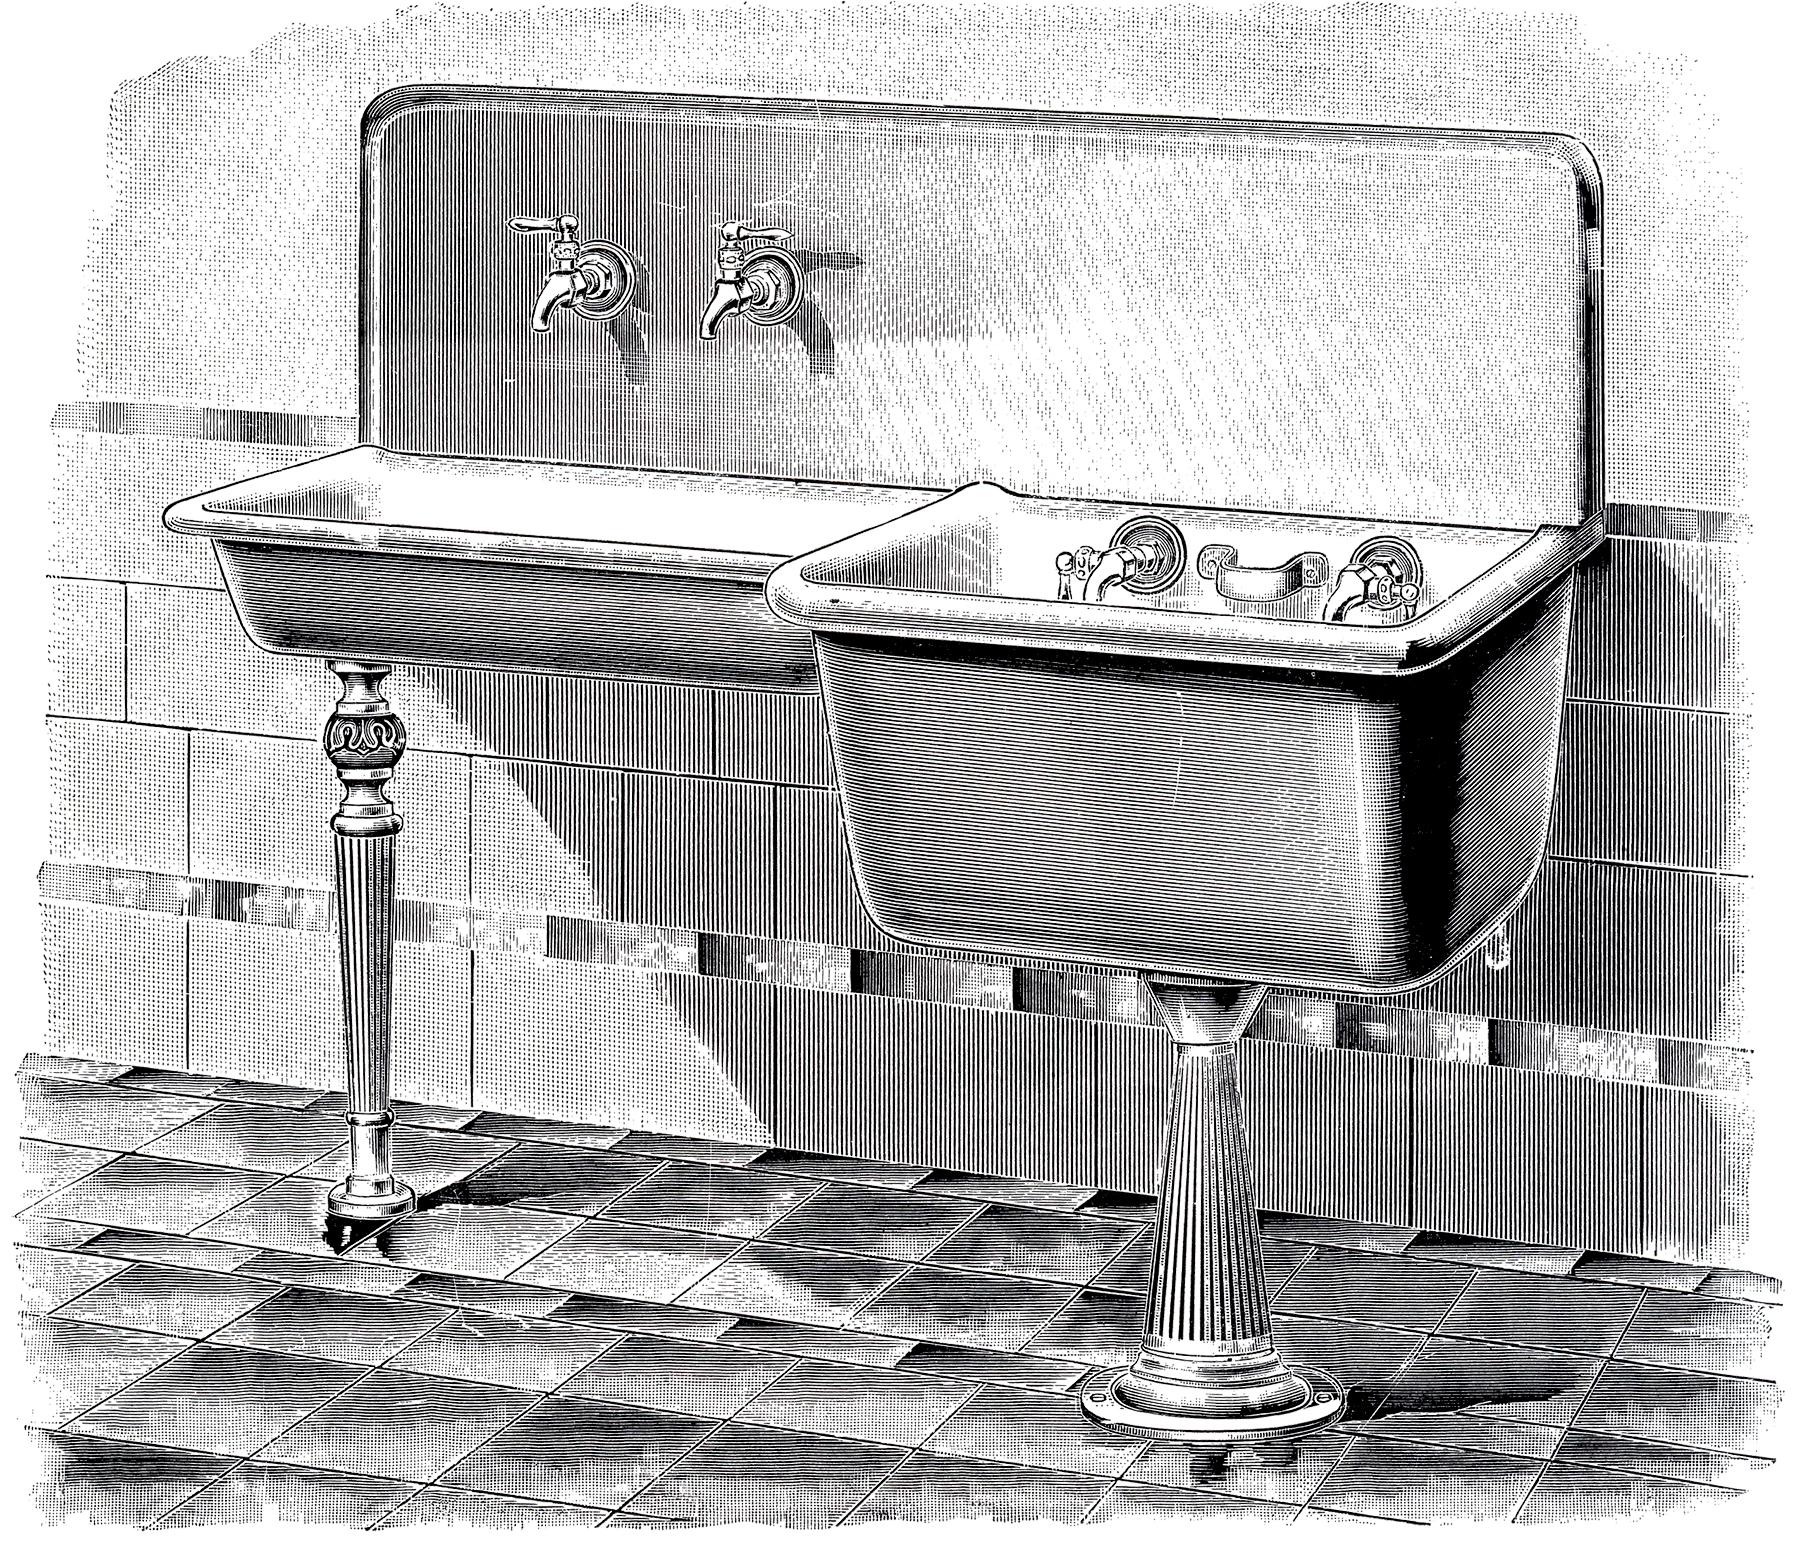 Vintage Laundry Sink Image